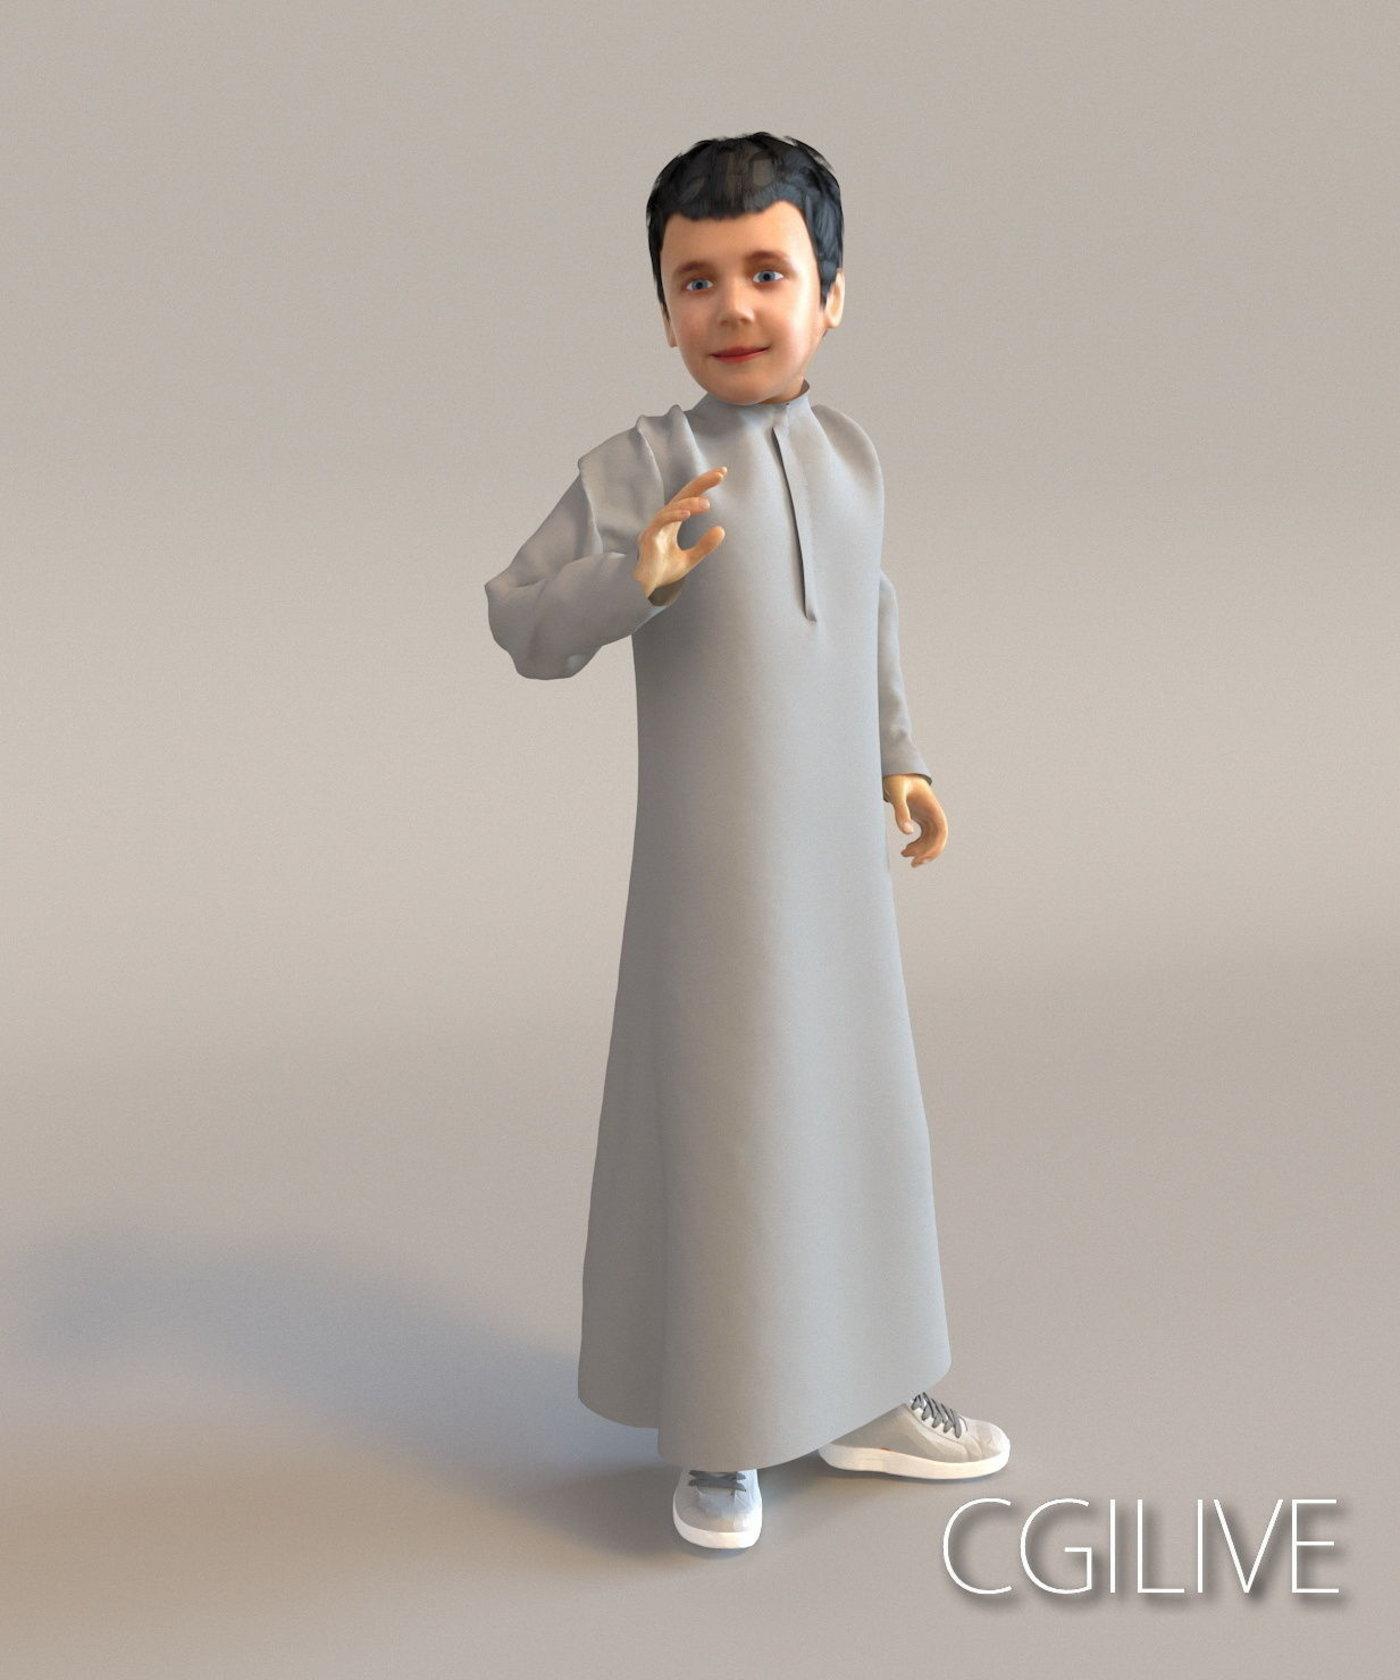 human girl character collection people female full body scan standing free vray realistic archviz Arab rabic white Muslim Arabian Islam Saudi people